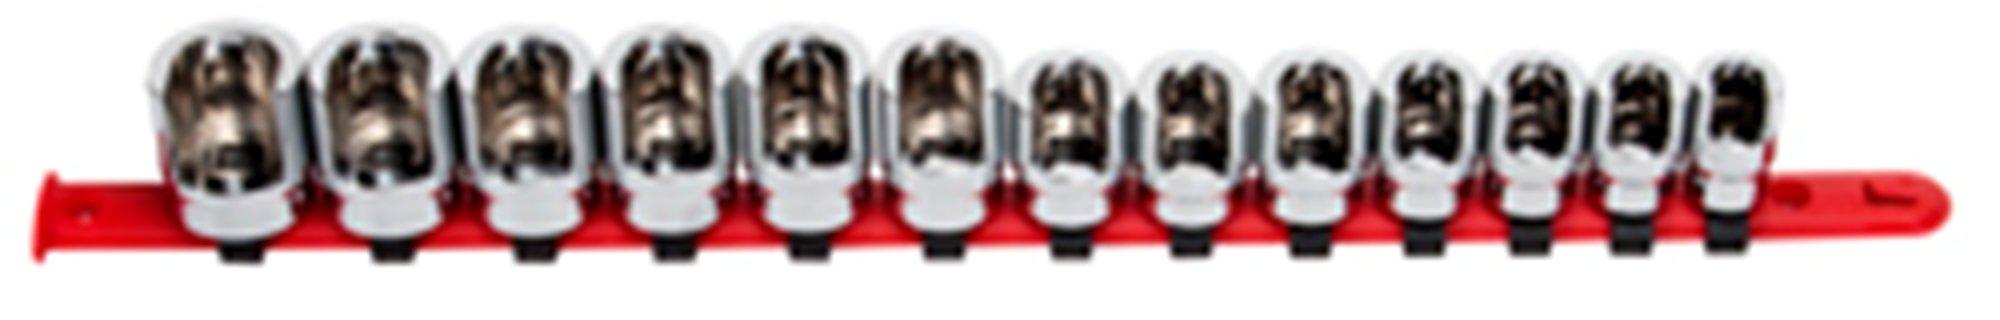 Sunex 9913 3/8-Inch Drive Weatherhead Socket Master Set, 13-Piece